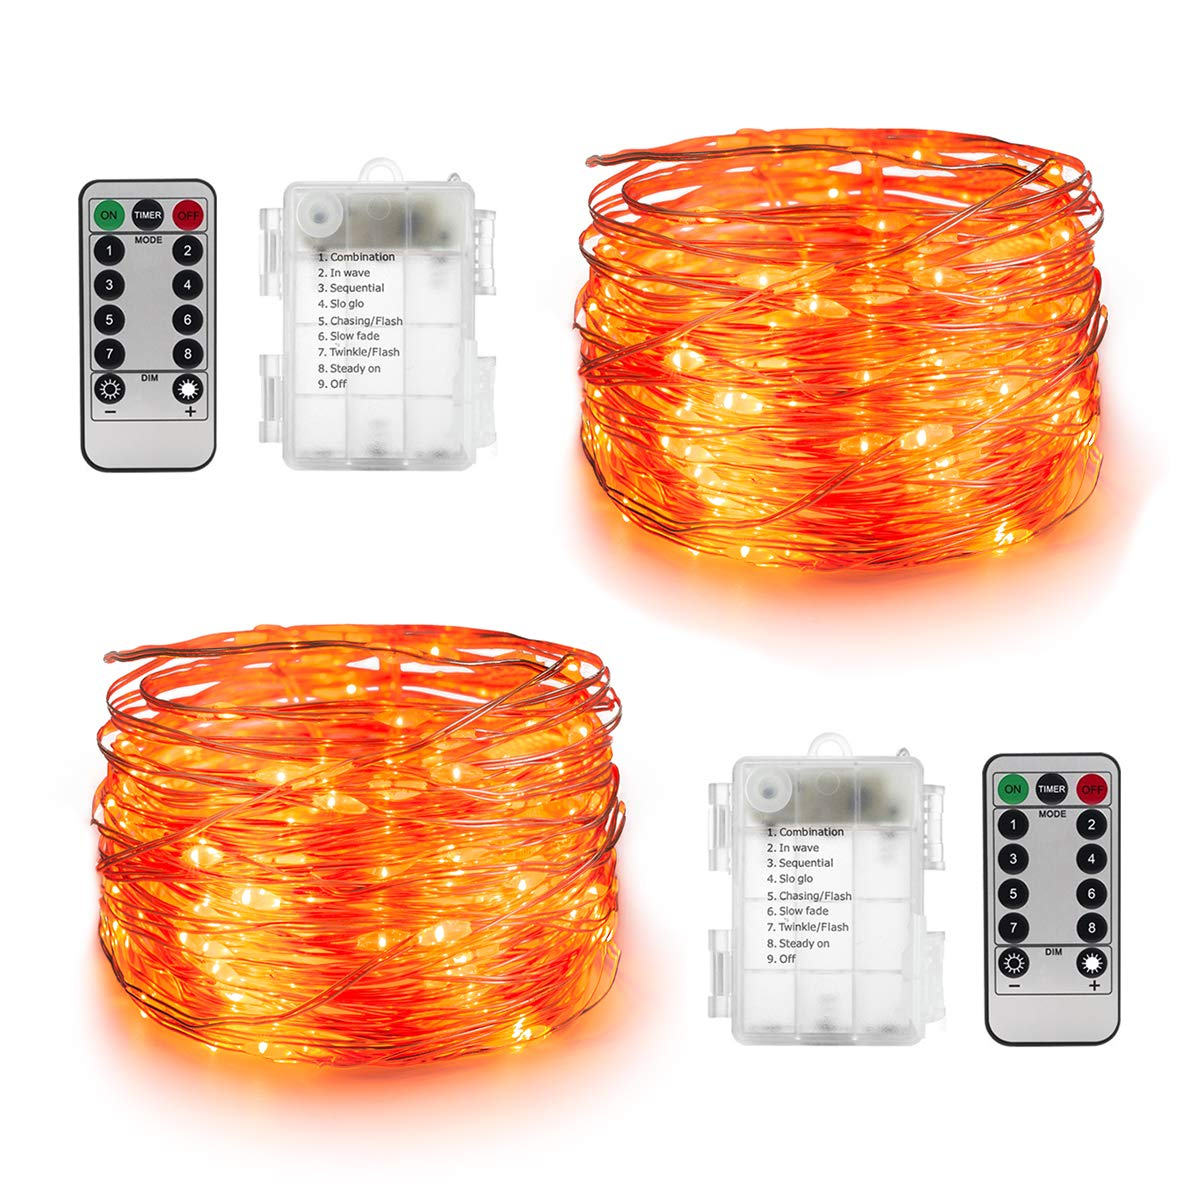 Battery Operated Orange Fairy Lights for Halloween Decorations Toodour Halloween Orange Lights 100 LED Orange String Lights